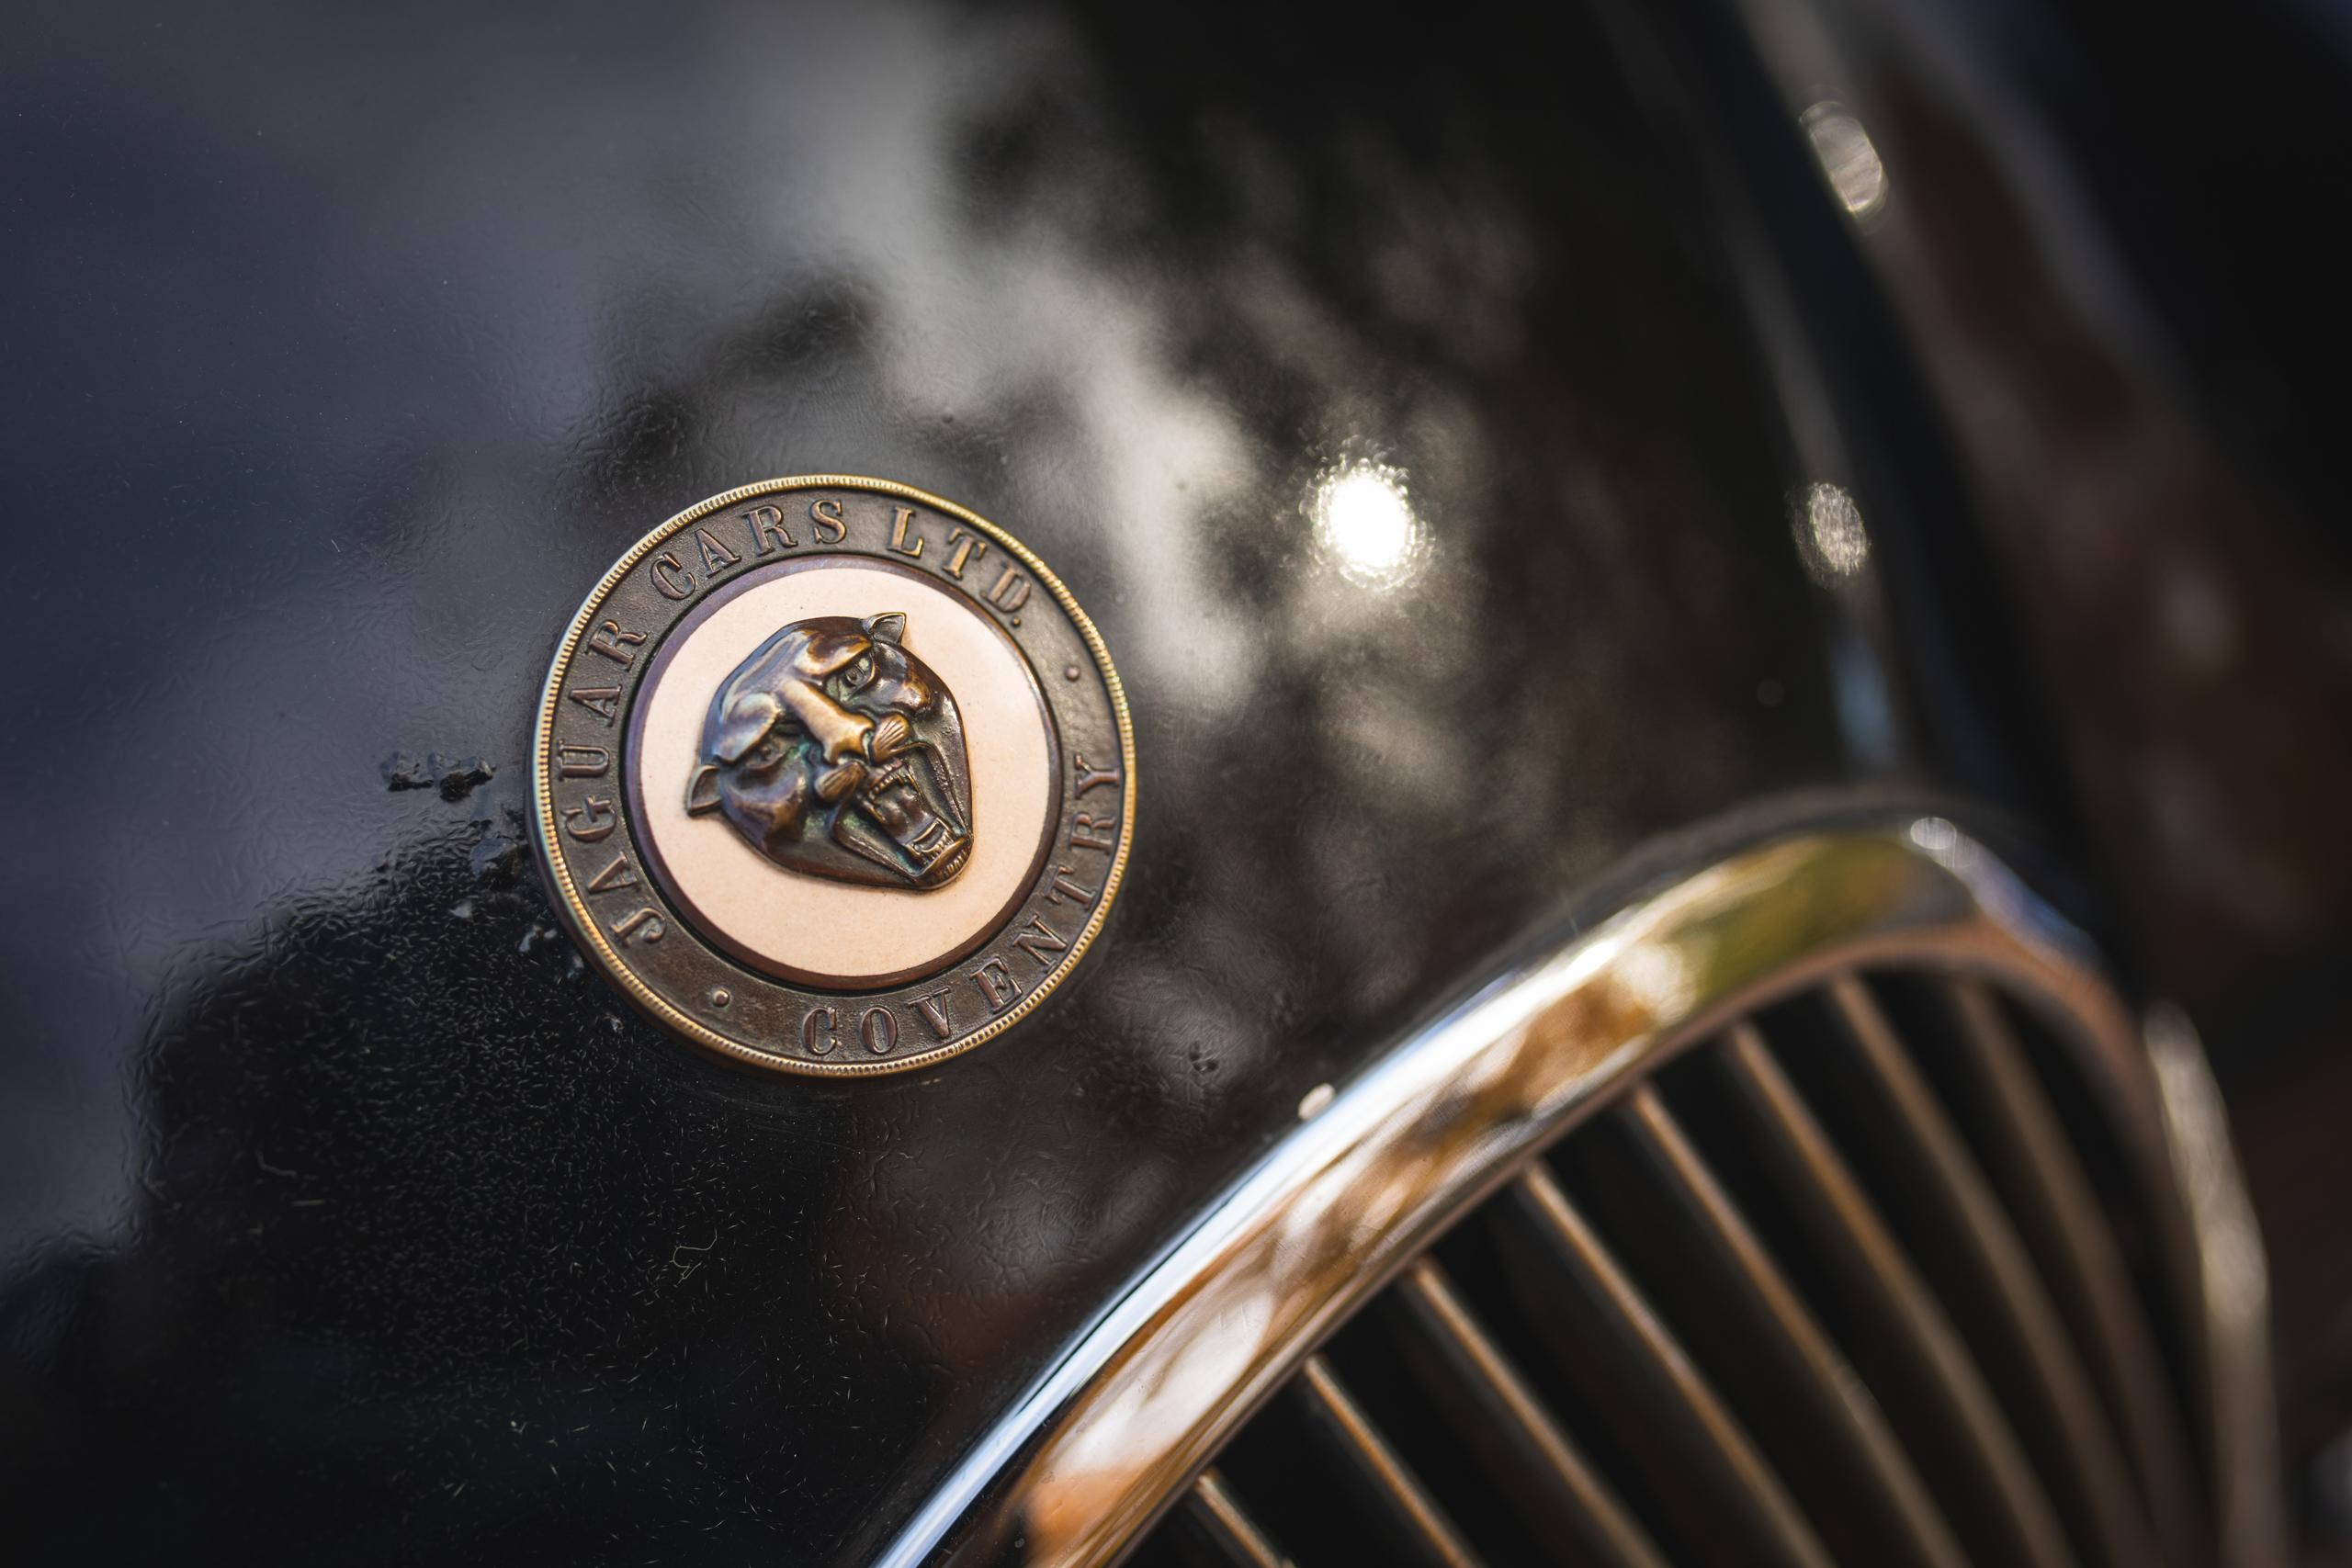 Jag XK120 emblem logo detail